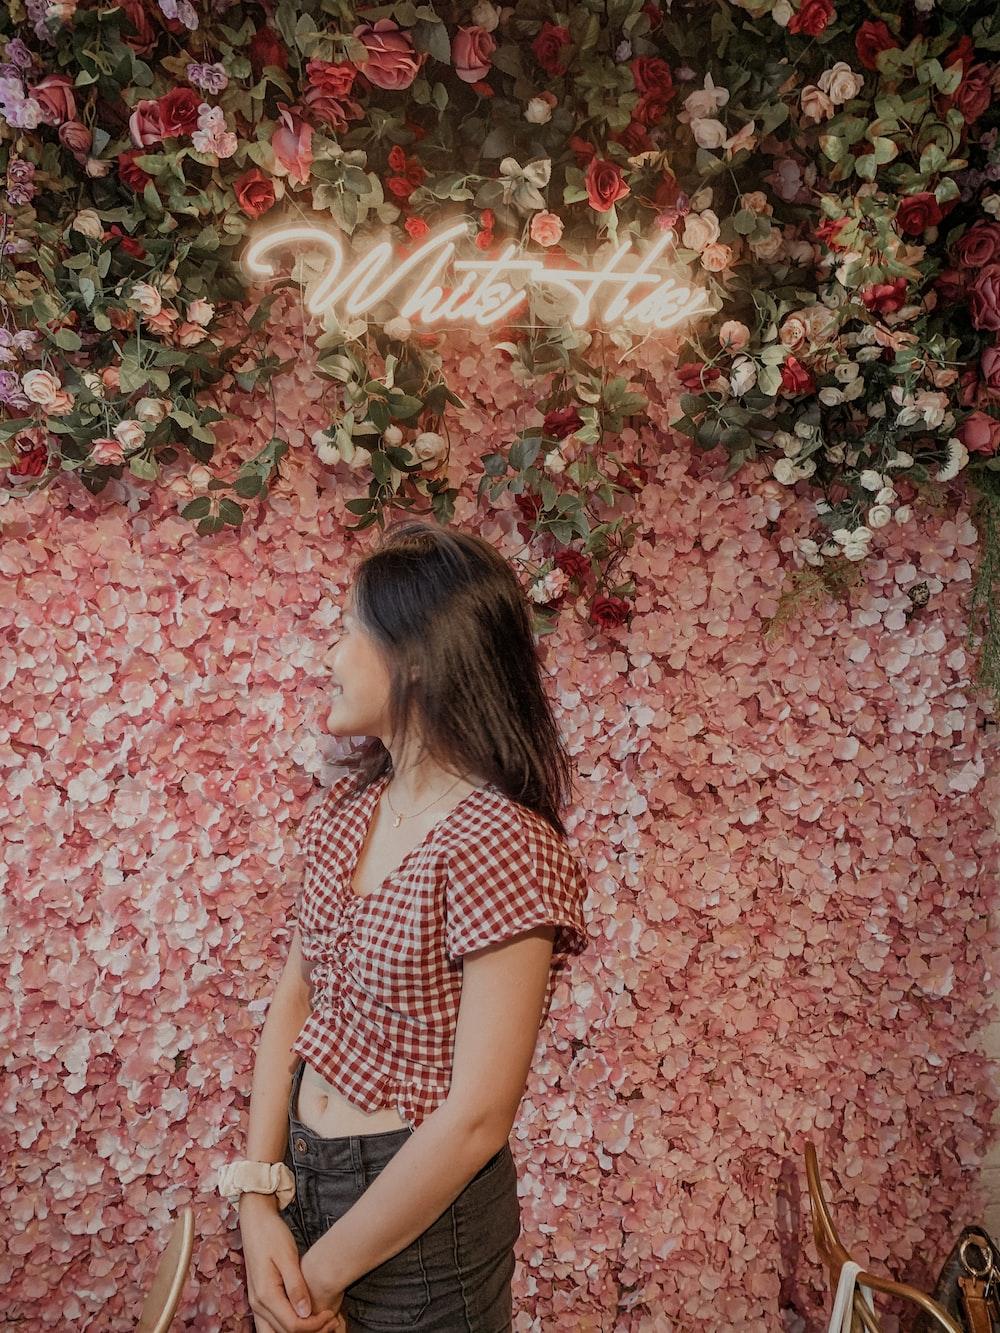 girl in black and white polka dot shirt standing on red leaves